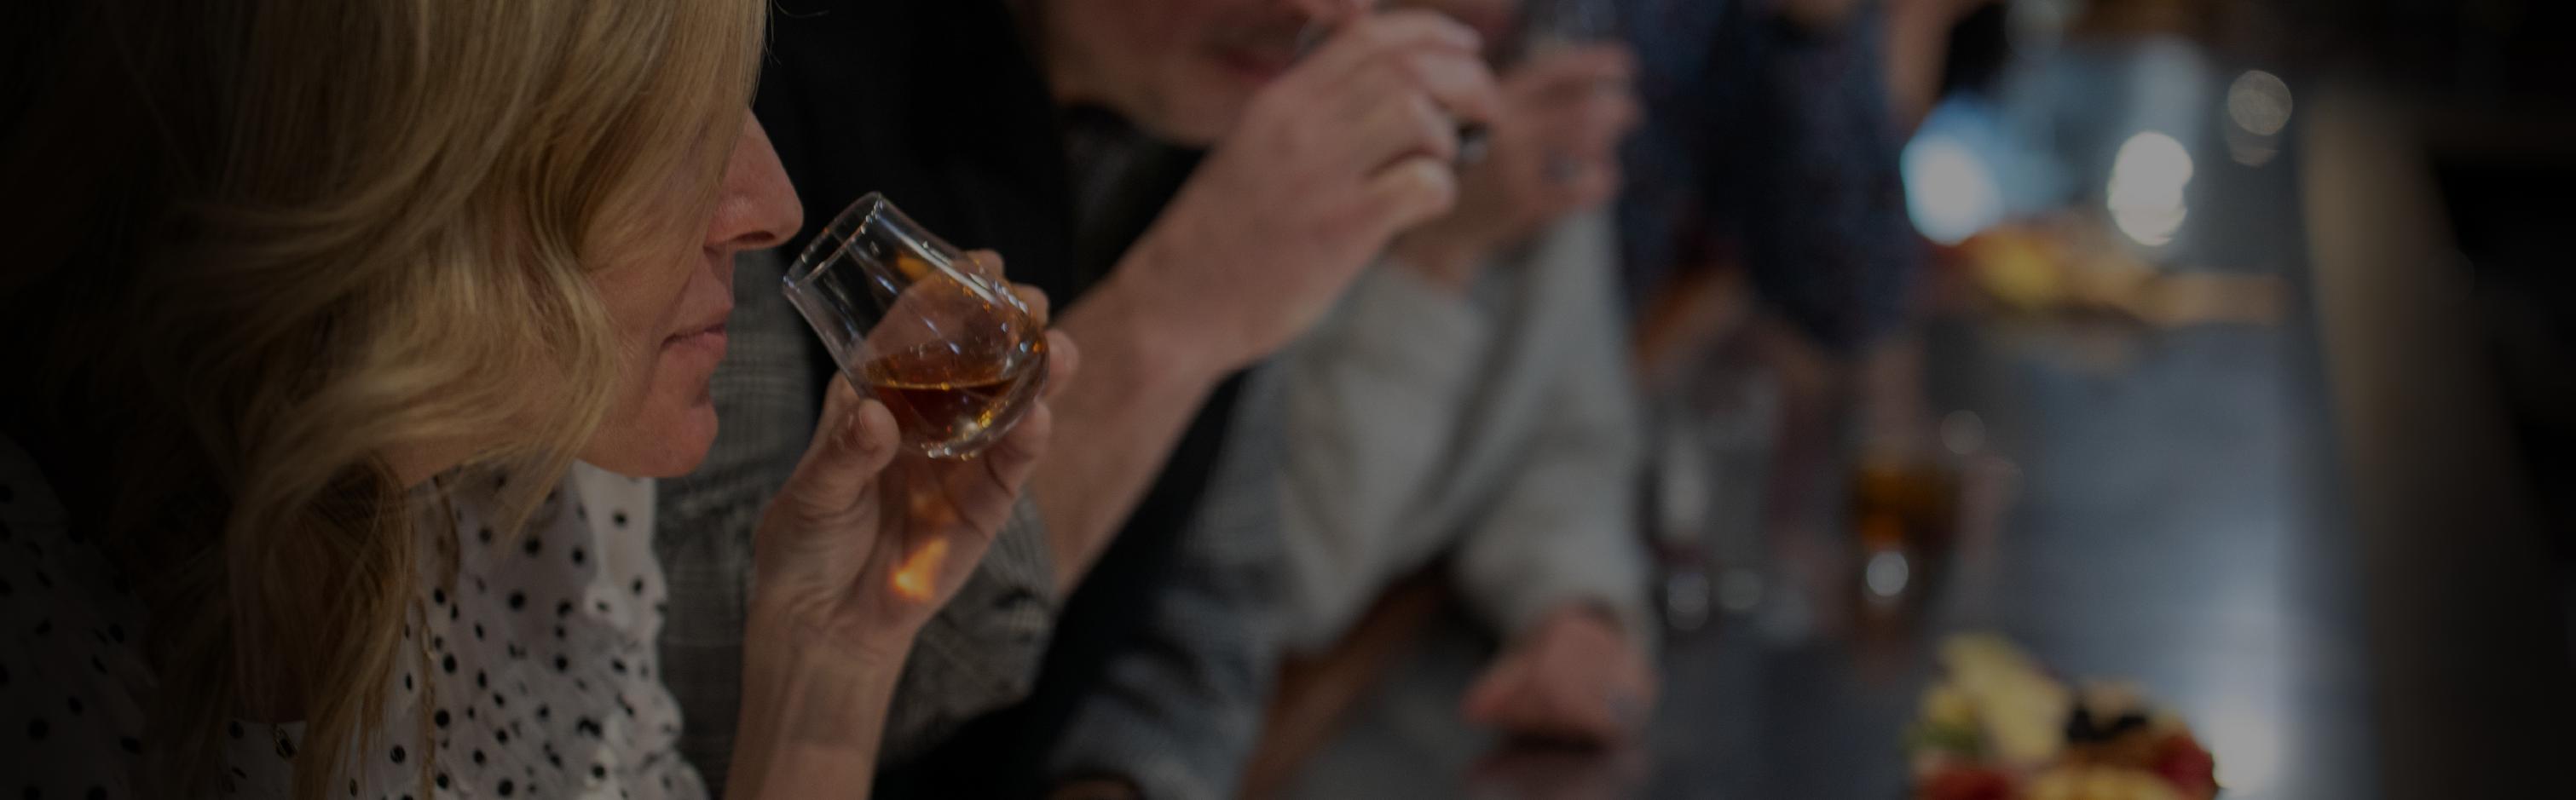 group having drinks